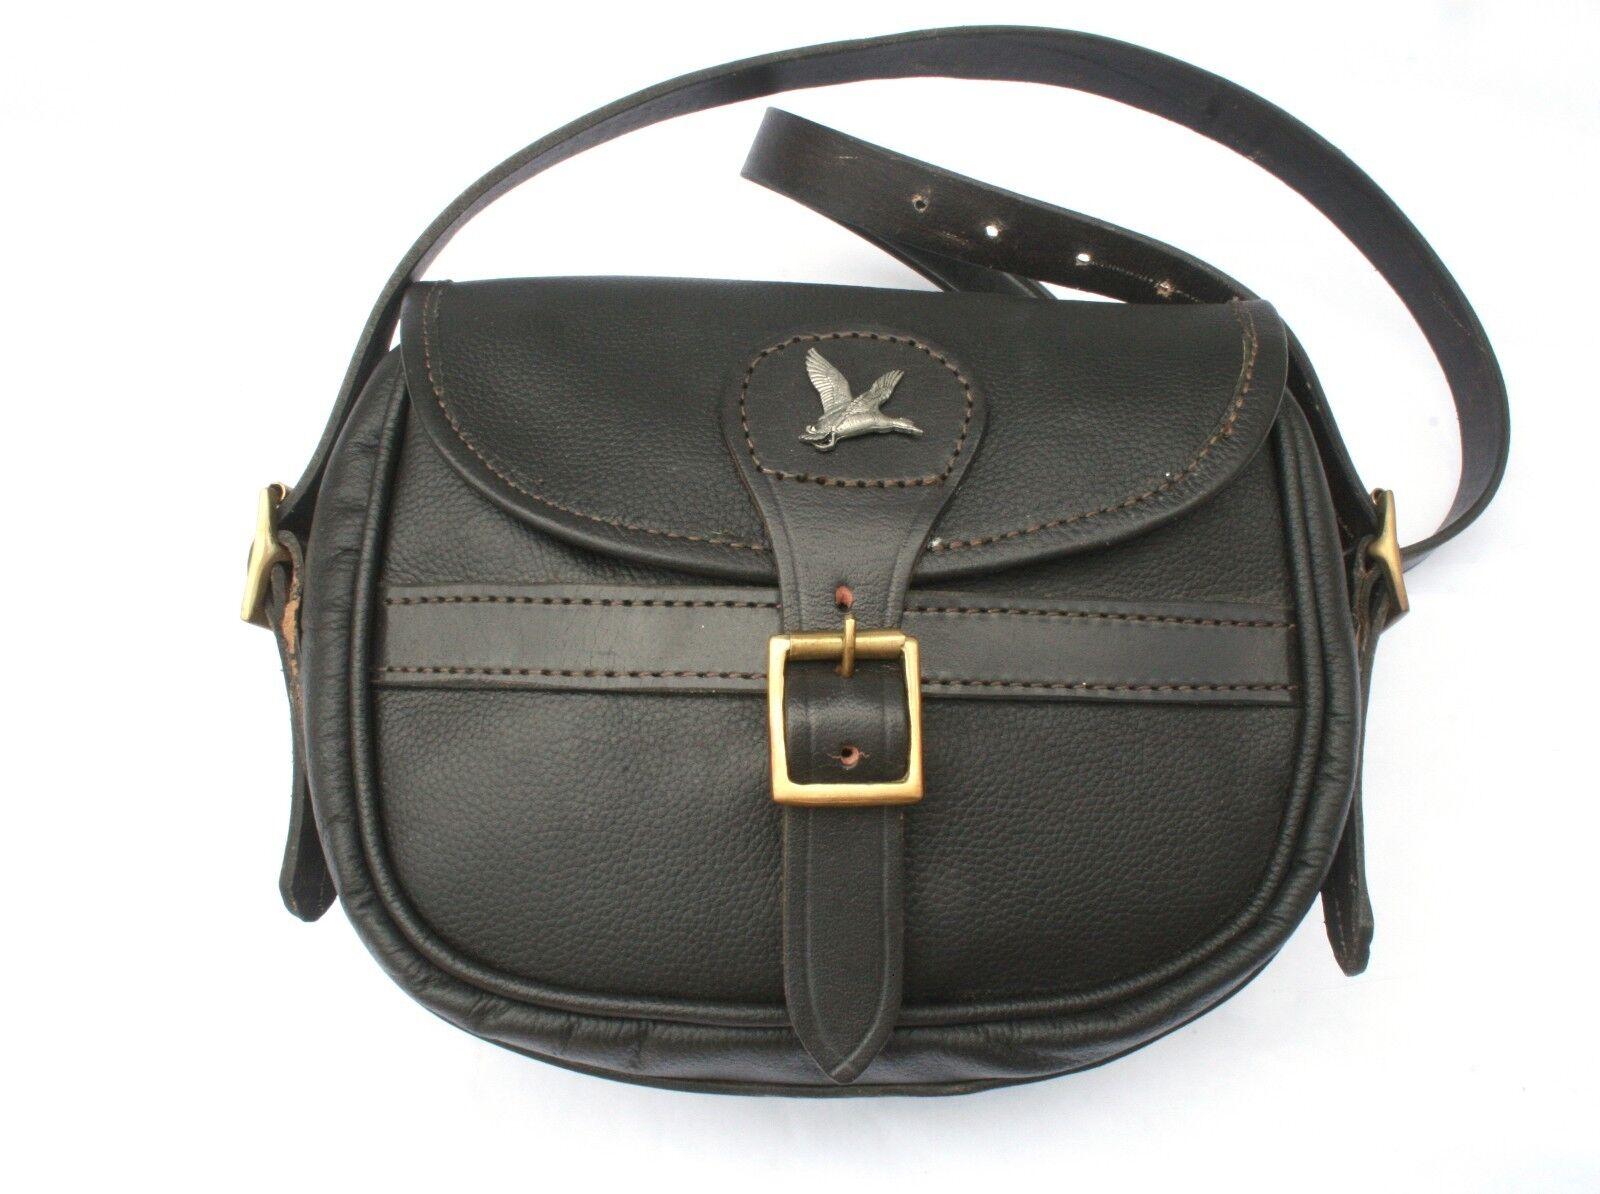 Mallard Bird Leather Cartridge Shooting Bag 75 Capacity Game Shooting Gift